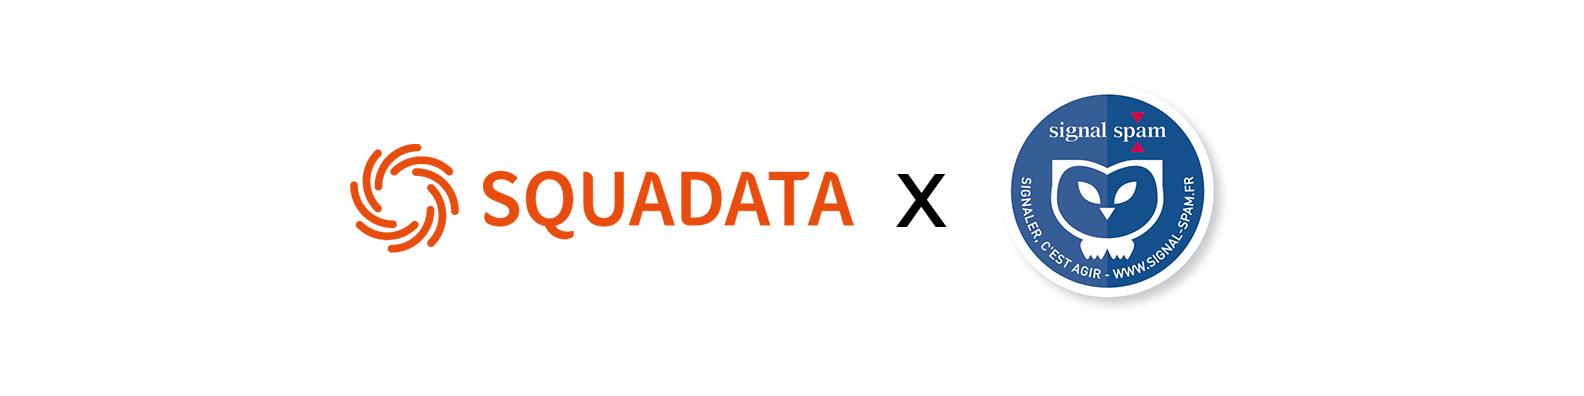 Squadata x Signal Spam logos